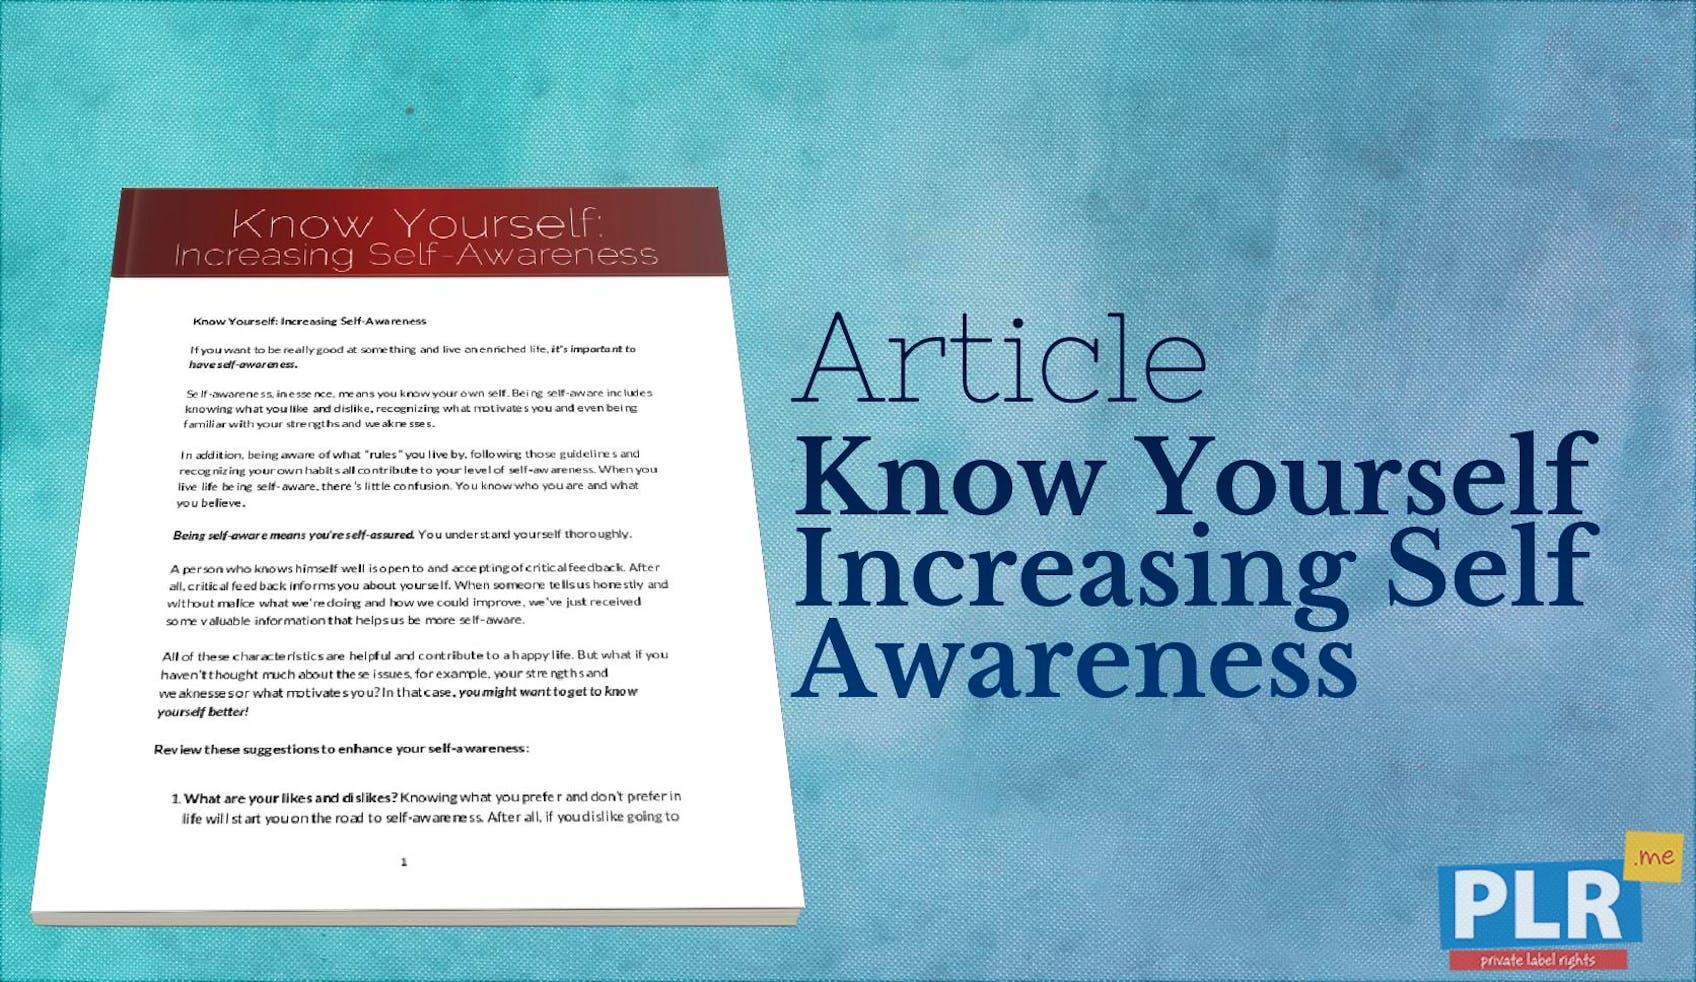 191db8efa PLR Articles   Blog Posts - Know Yourself Increasing Self Awareness - PLR.me